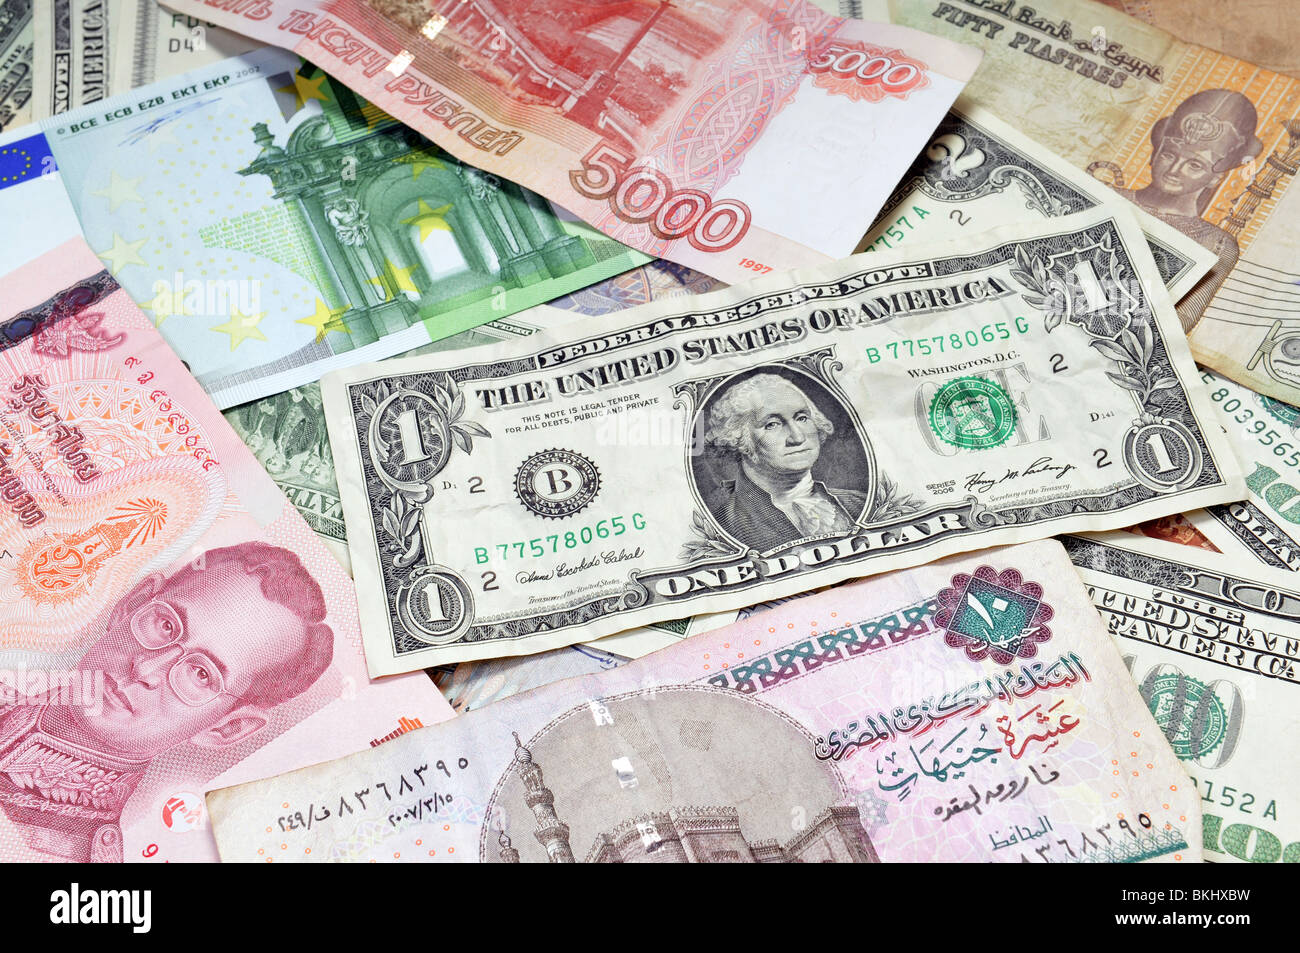 Евро доллары рубли фото